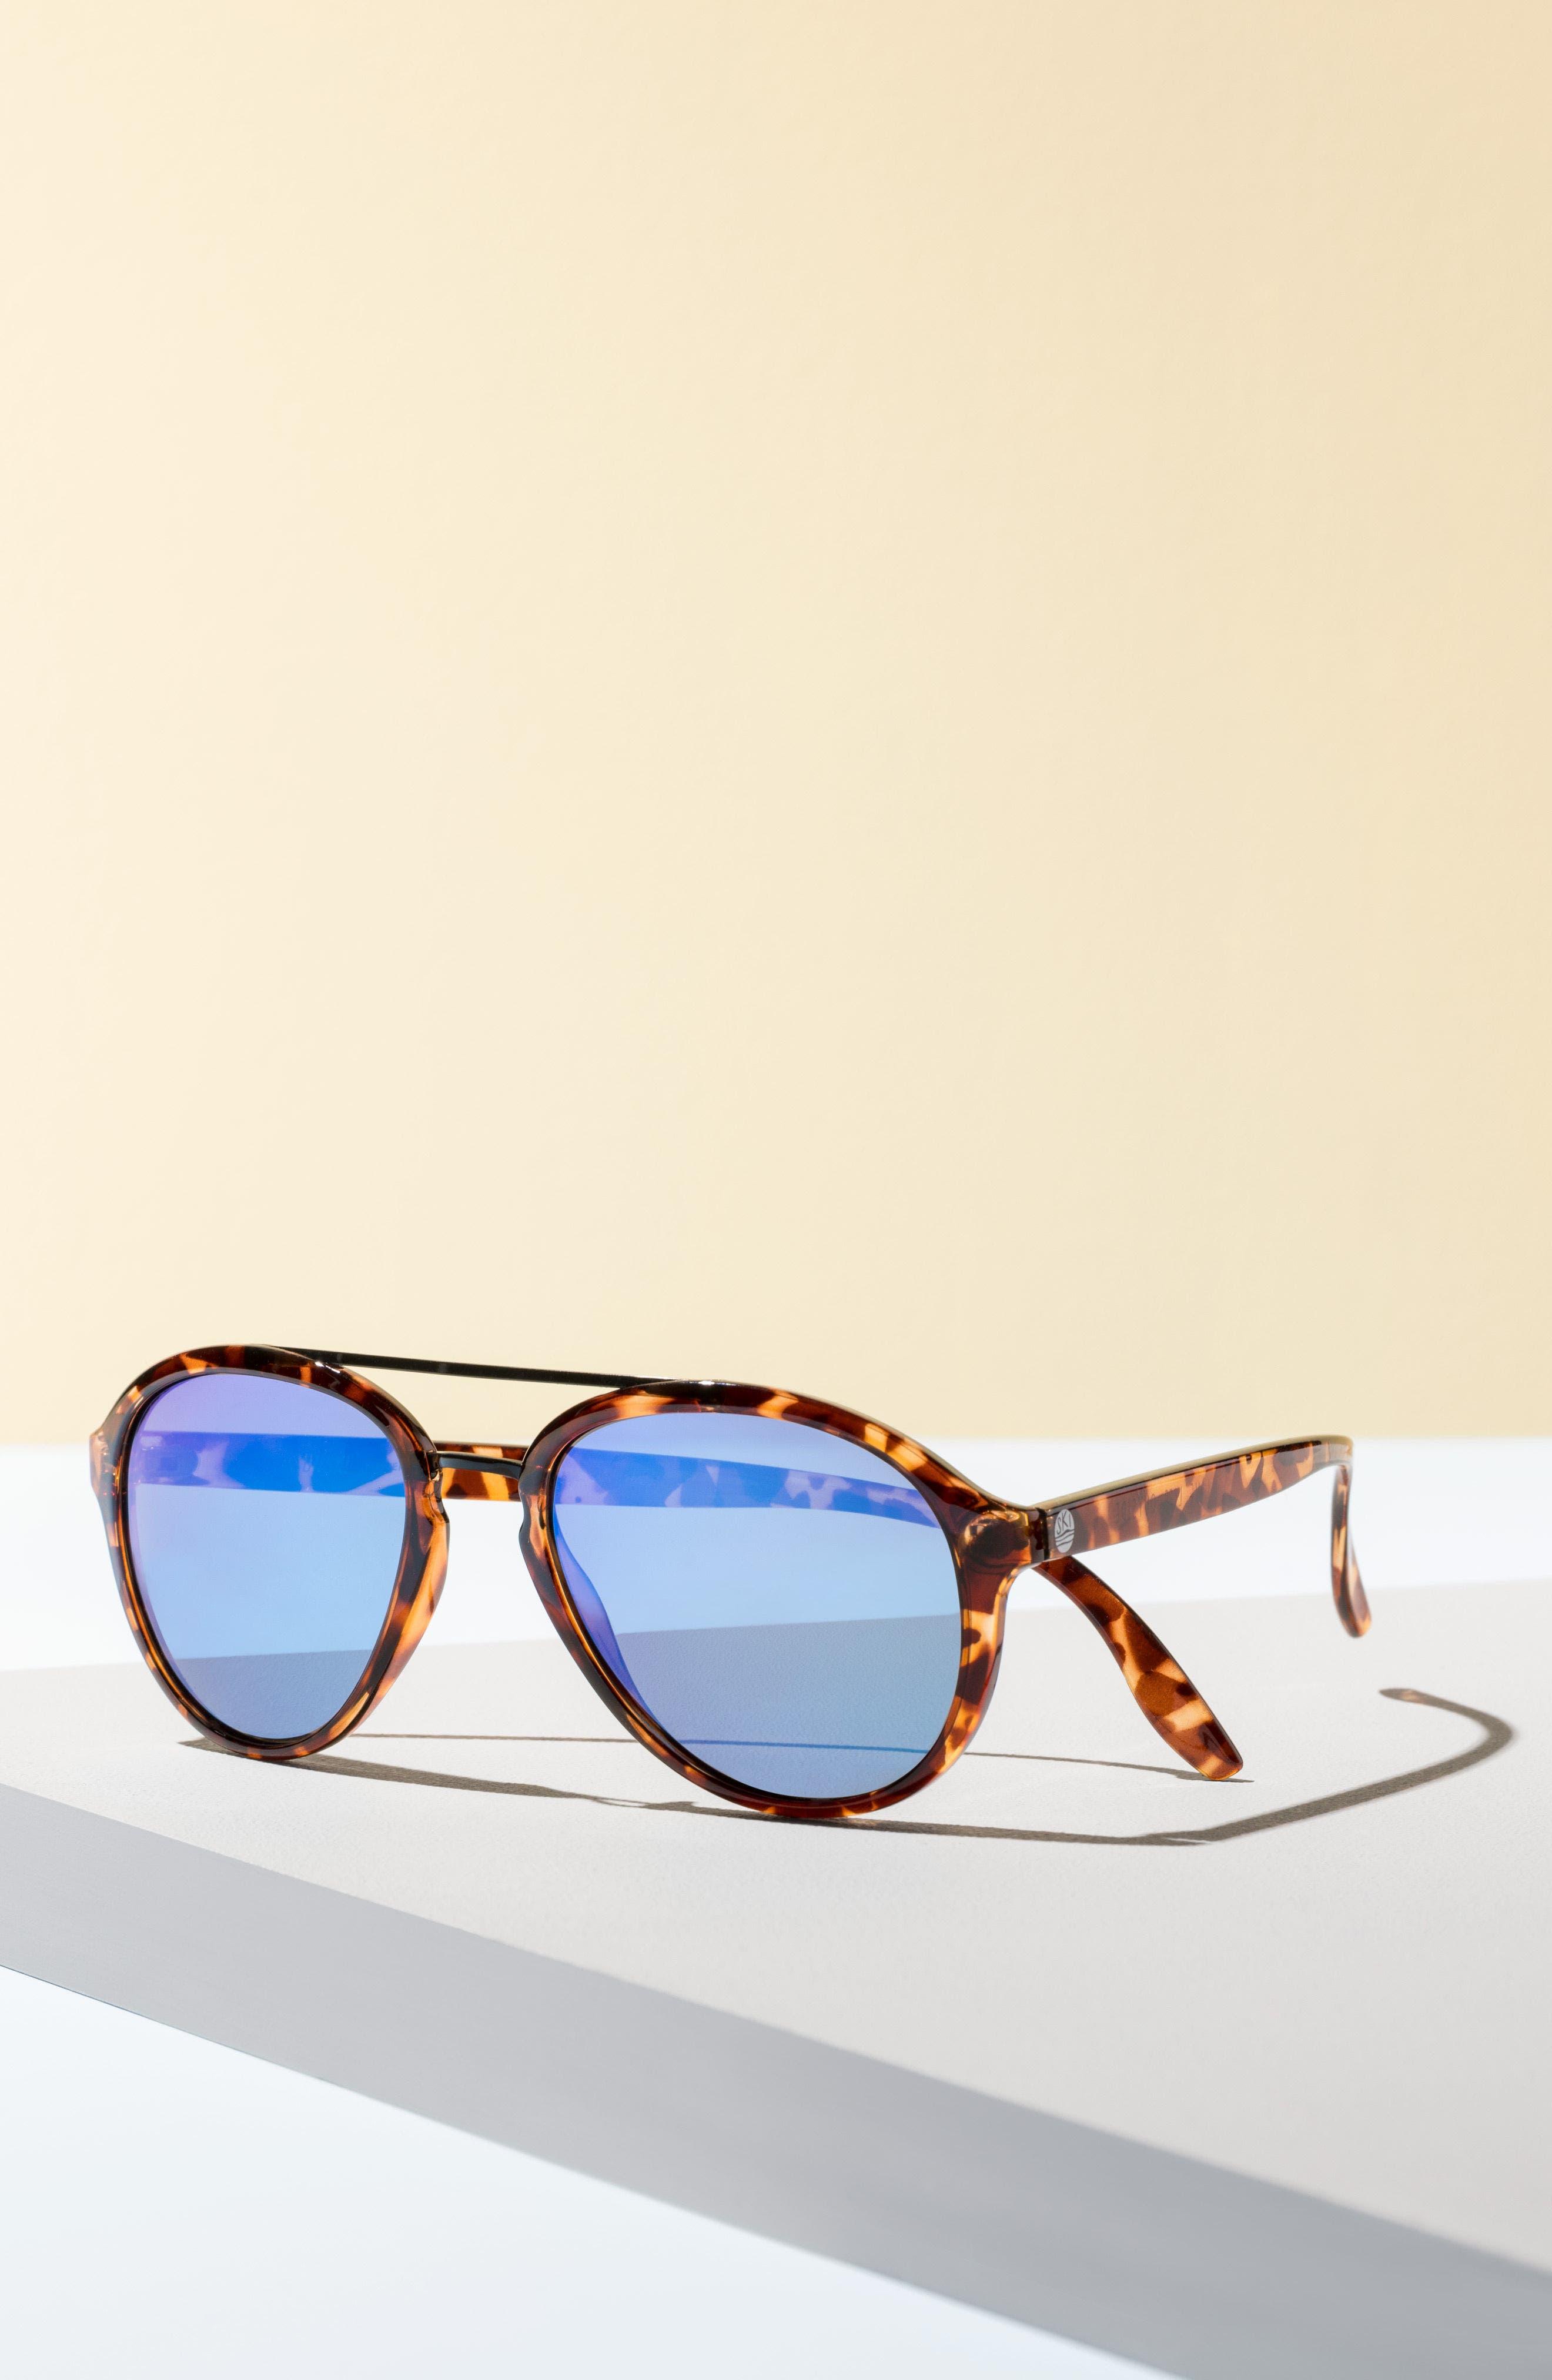 Plover 60mm Polarized Sunglasses,                             Alternate thumbnail 4, color,                             BLACK/ SLATE